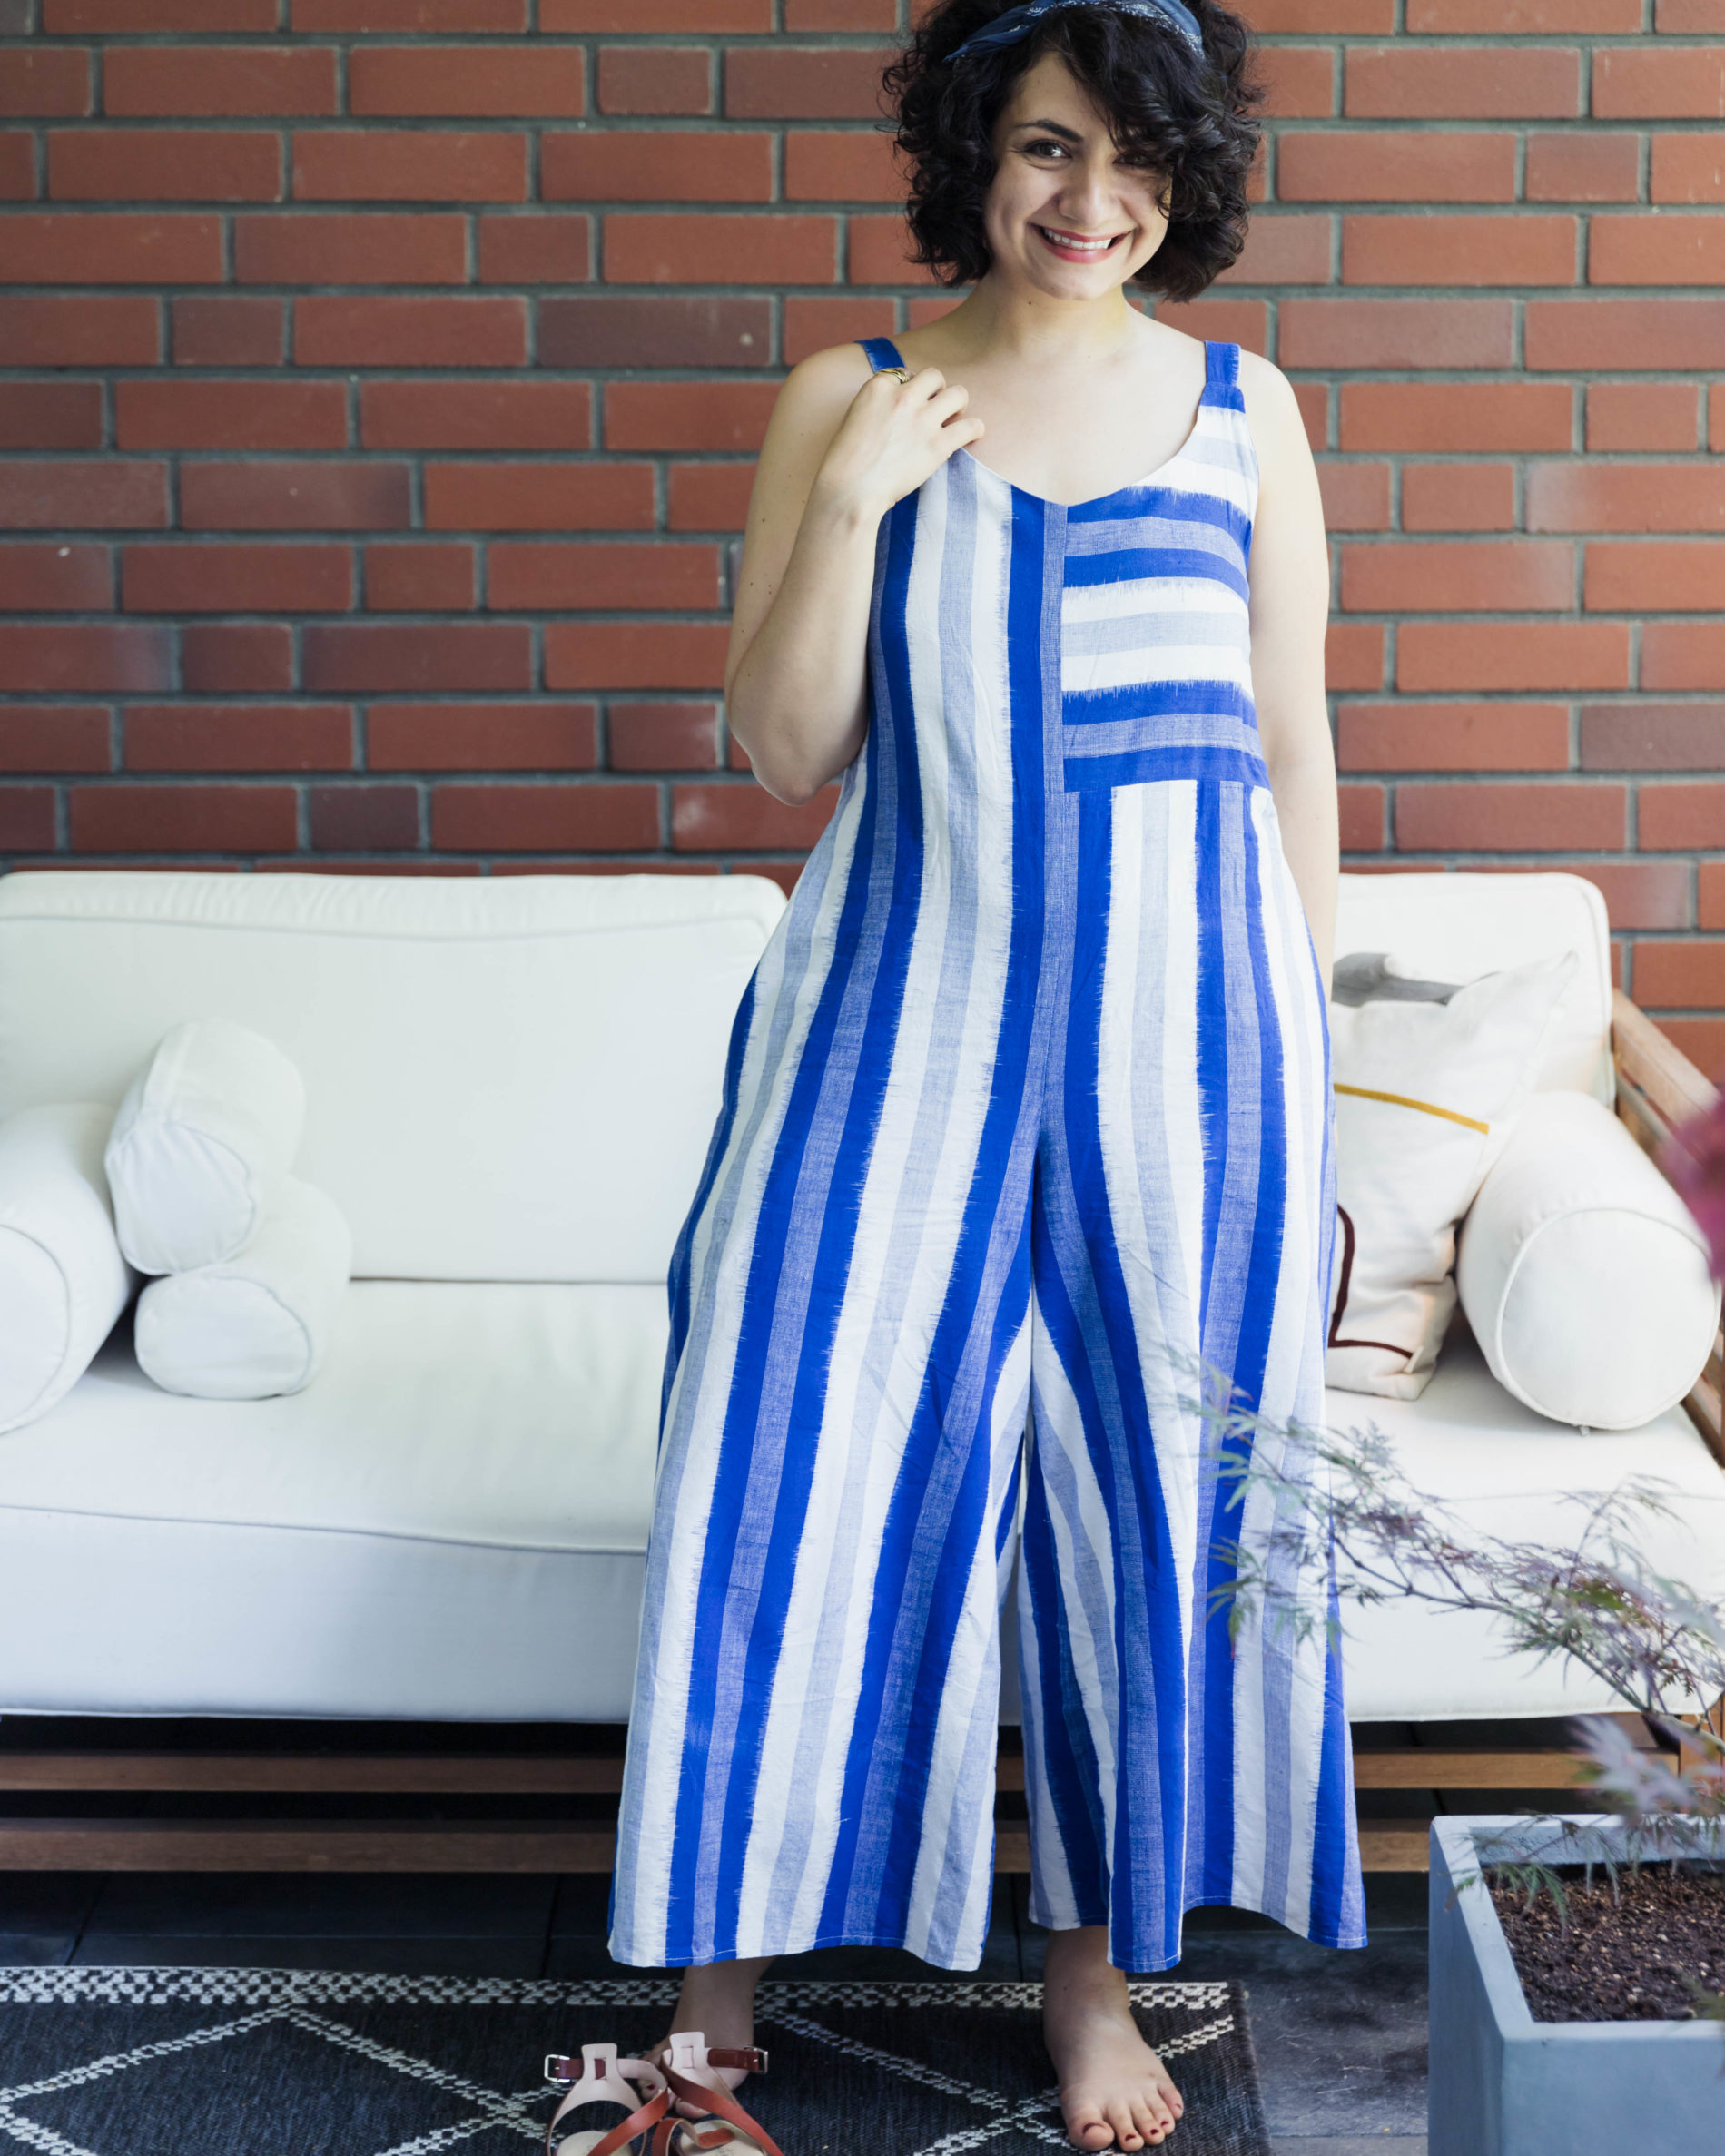 Jumpsuit nähen gestreifter Amy Jumpsuit Schnittmuster von Closet Case Patterns - Tweed & Greet